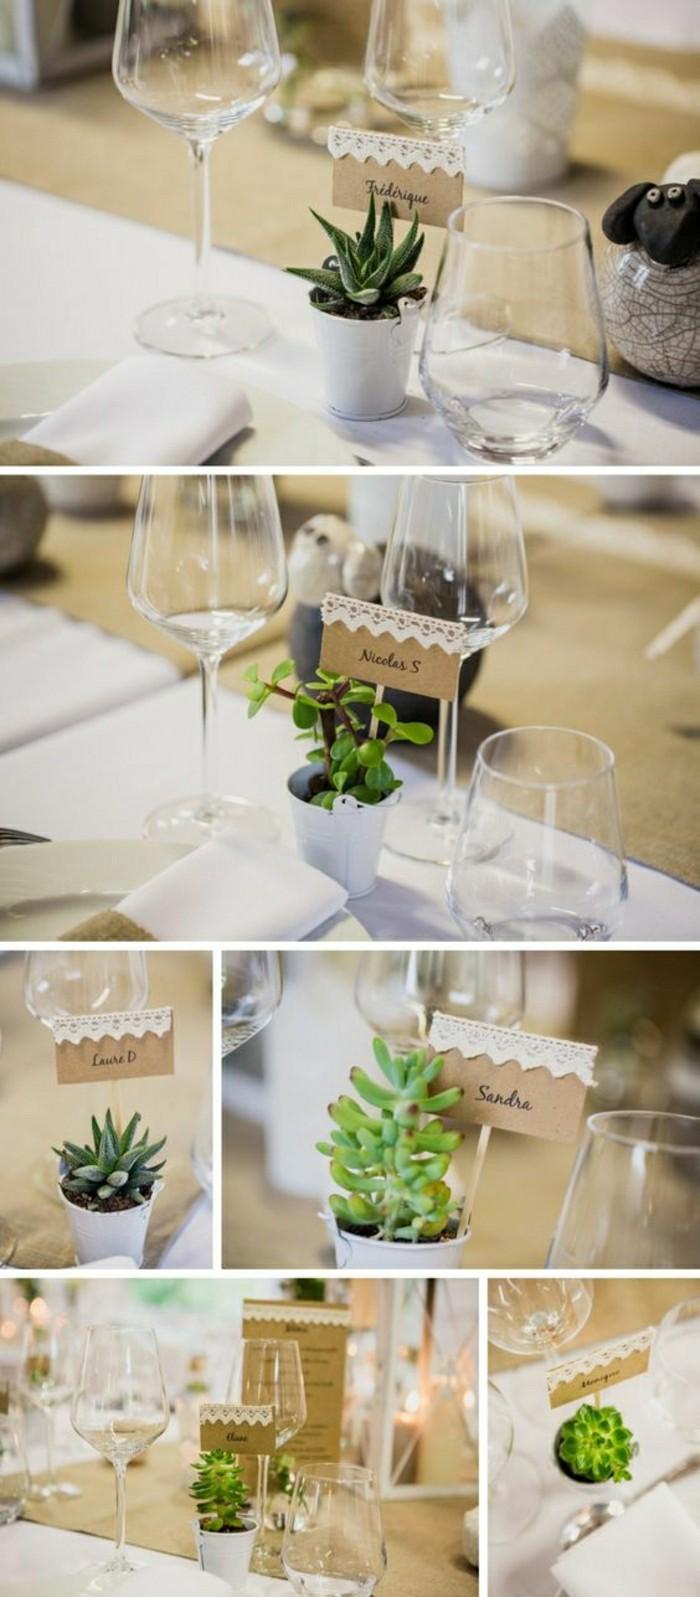 originale-idee-deco-table-mariage-avec-plante-verte-décoration-de-table-mariage-avec-plantes-vertes-en-cache-pot